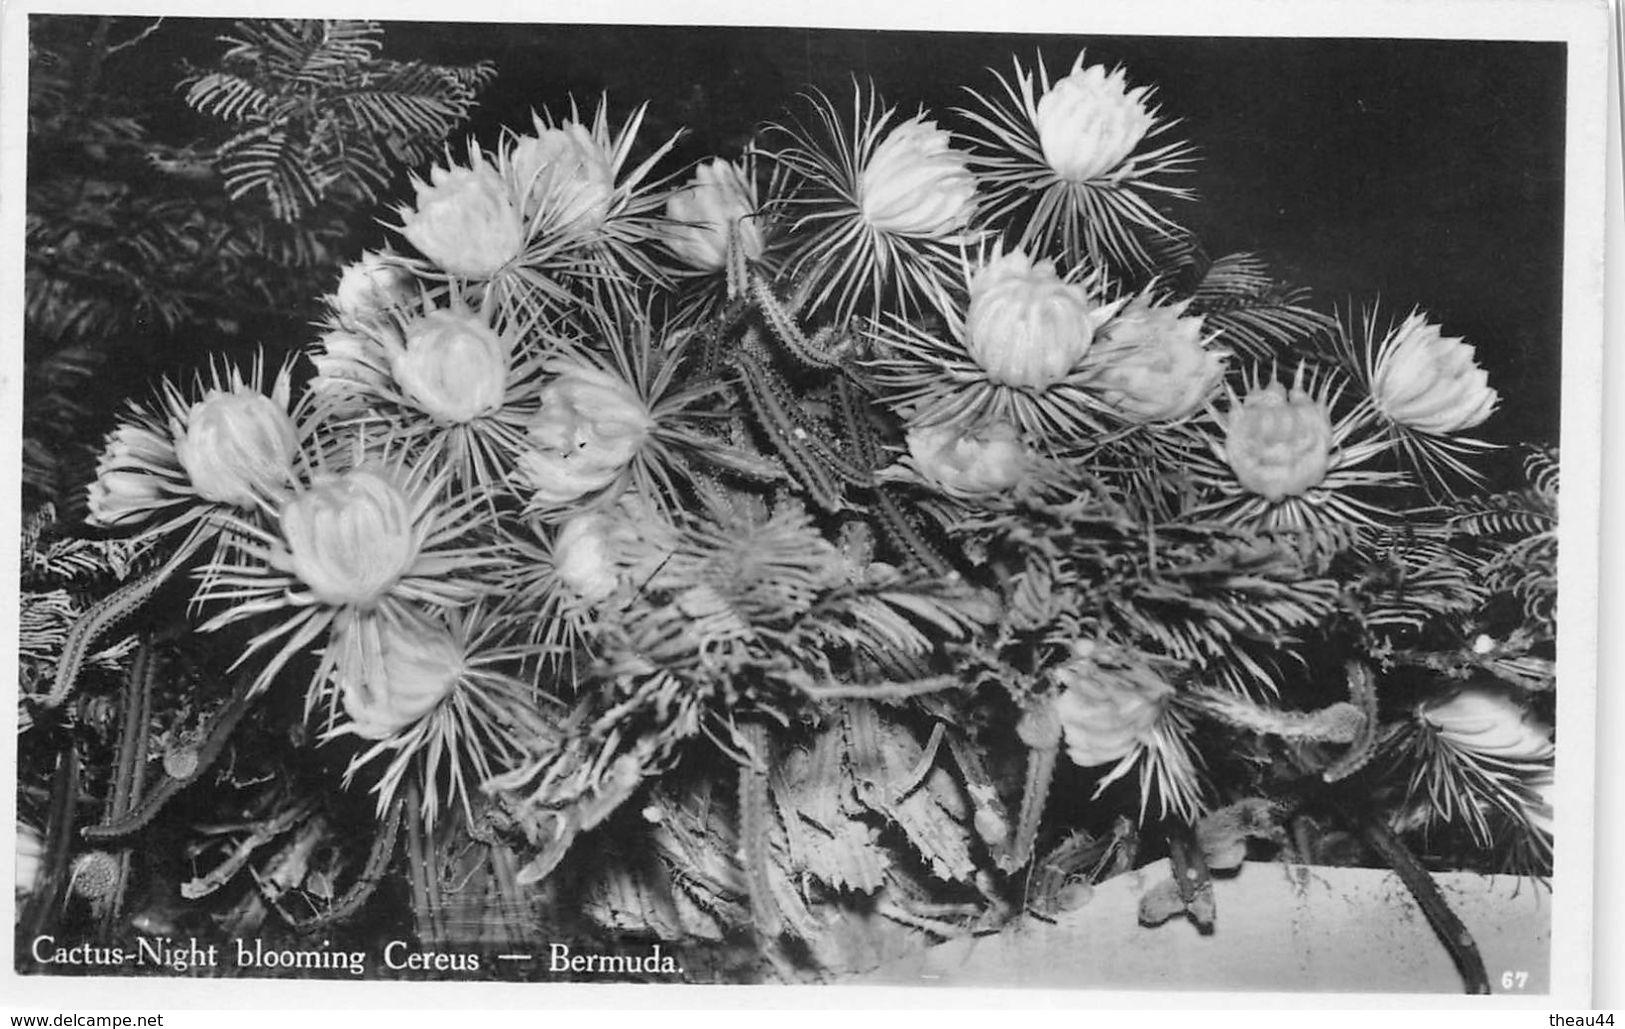 ¤¤  -  ANTILLES   -   BERMUDA   -  Cactus-Nigth Blooming Cereus  -  ¤¤ - Bermudes